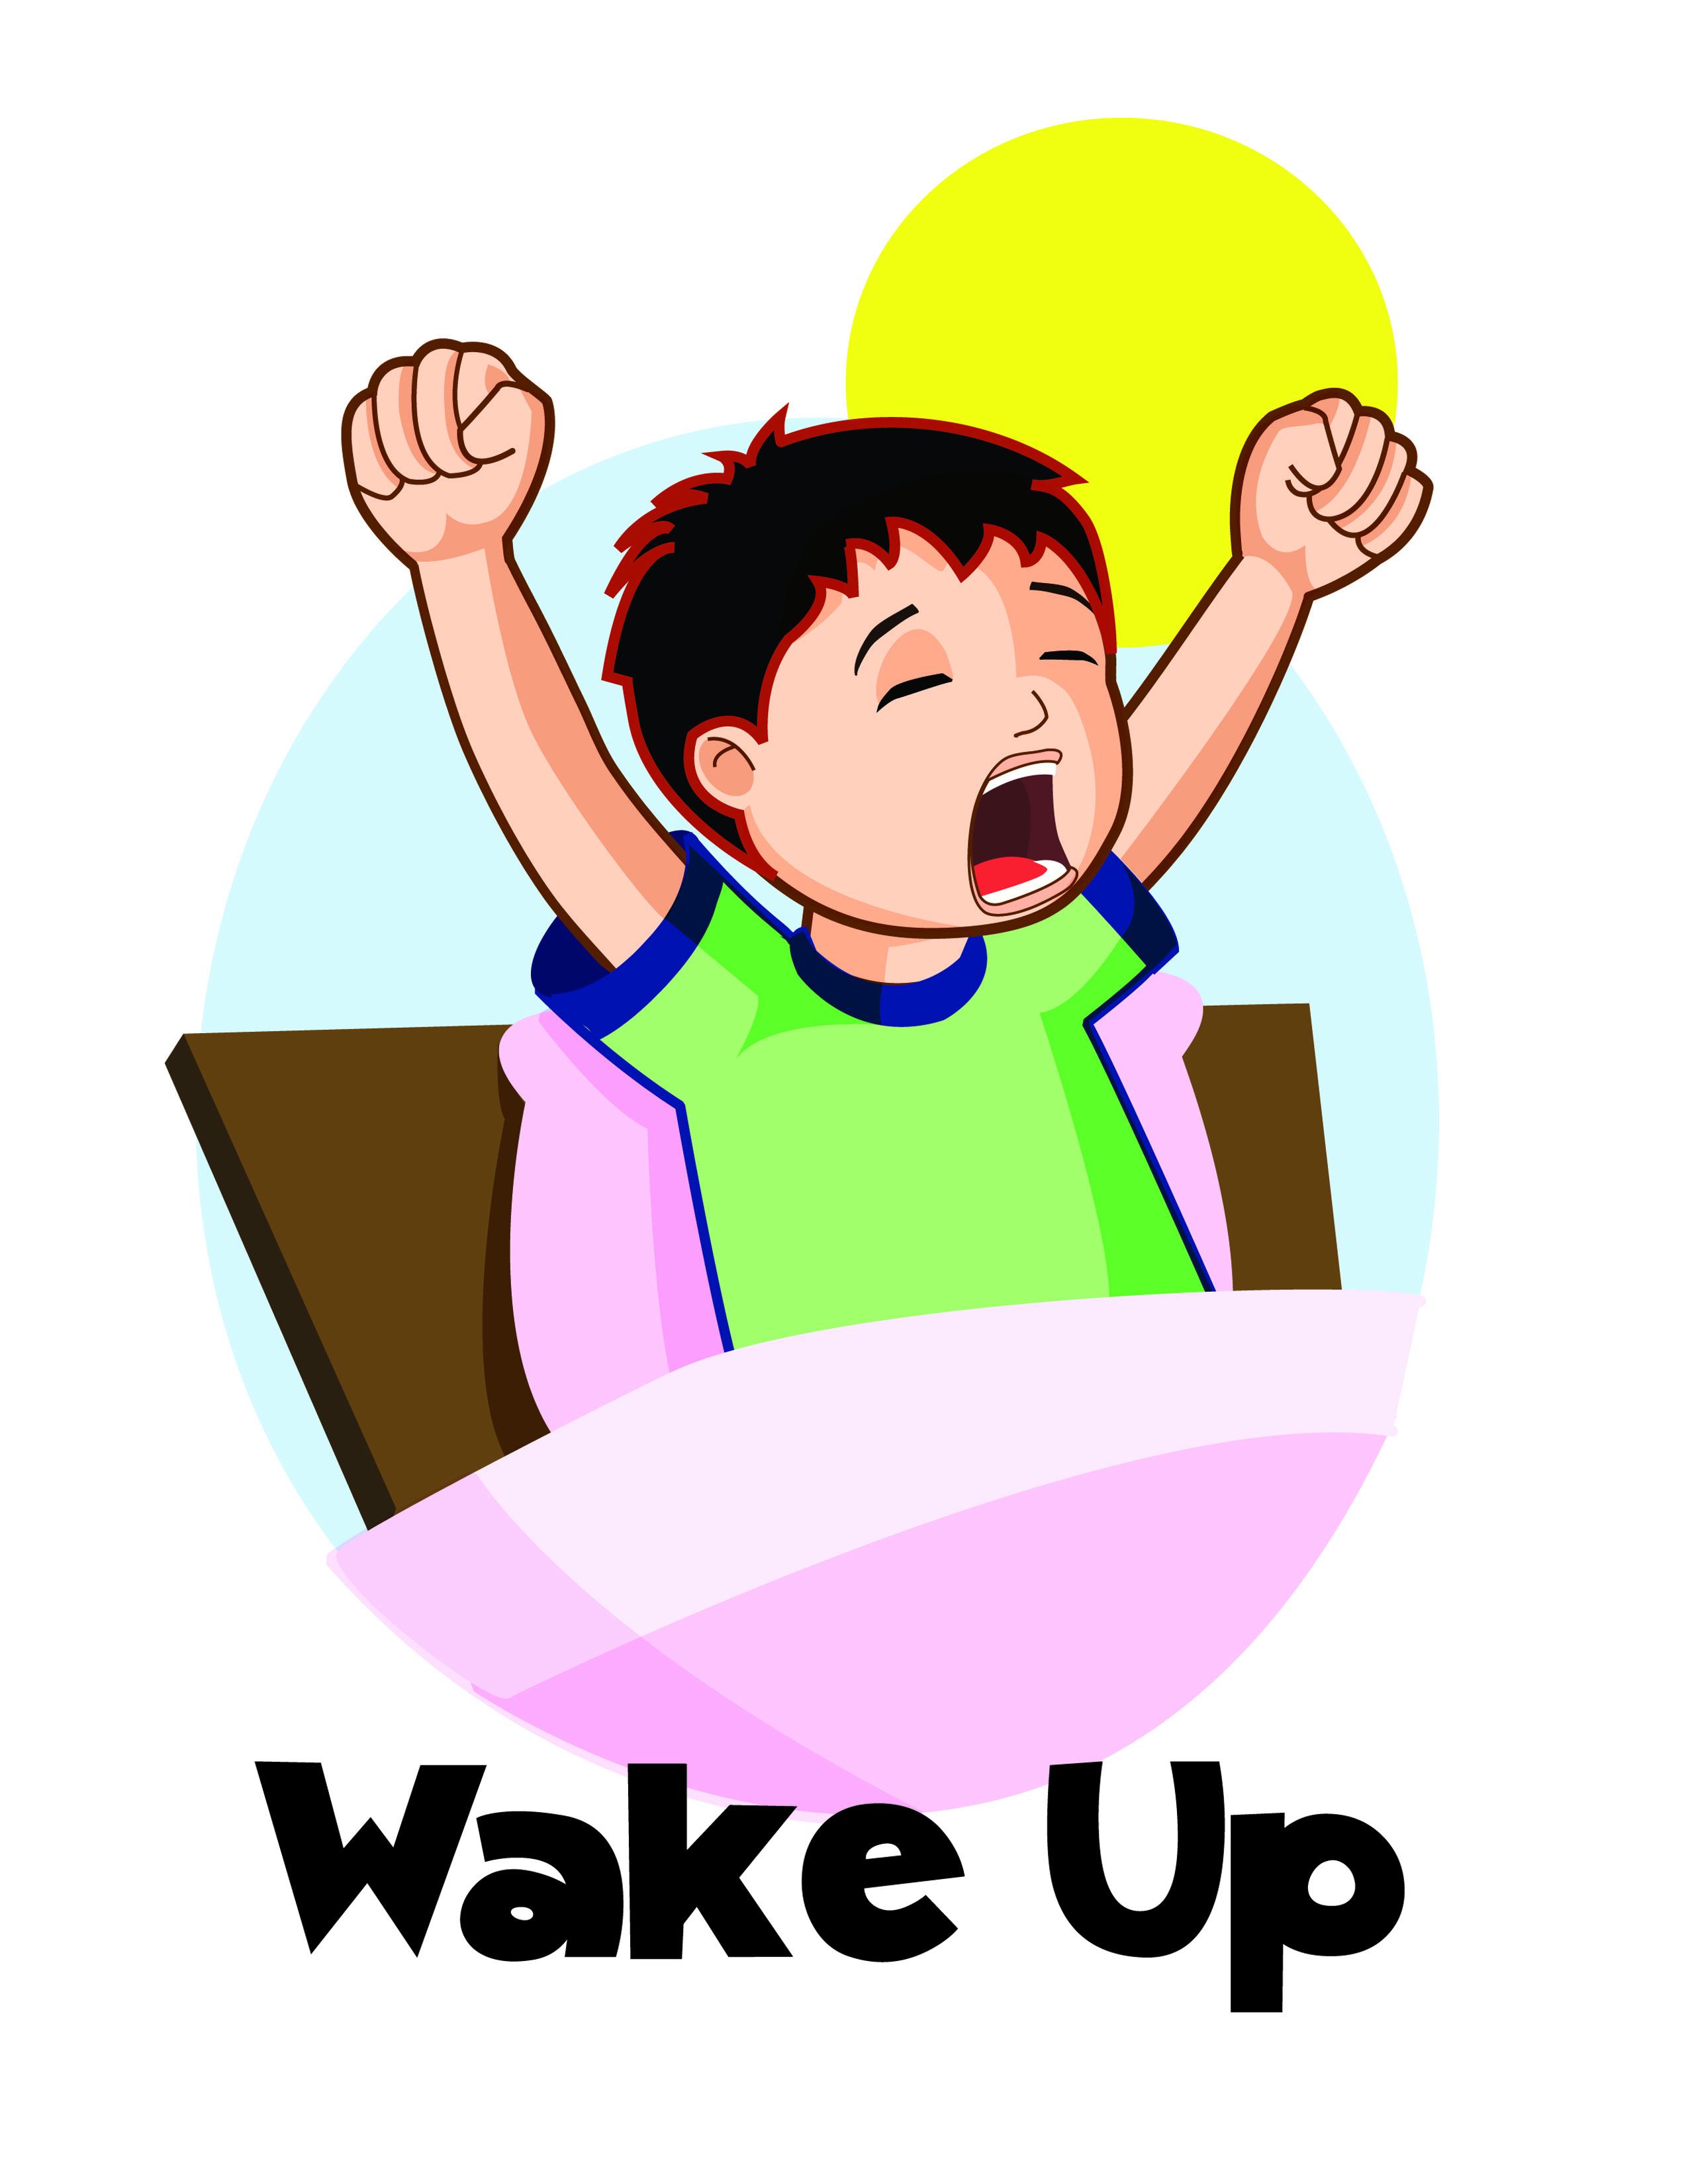 Wake Up Clipart Cliparts Co-Wake Up Clipart Cliparts Co-12